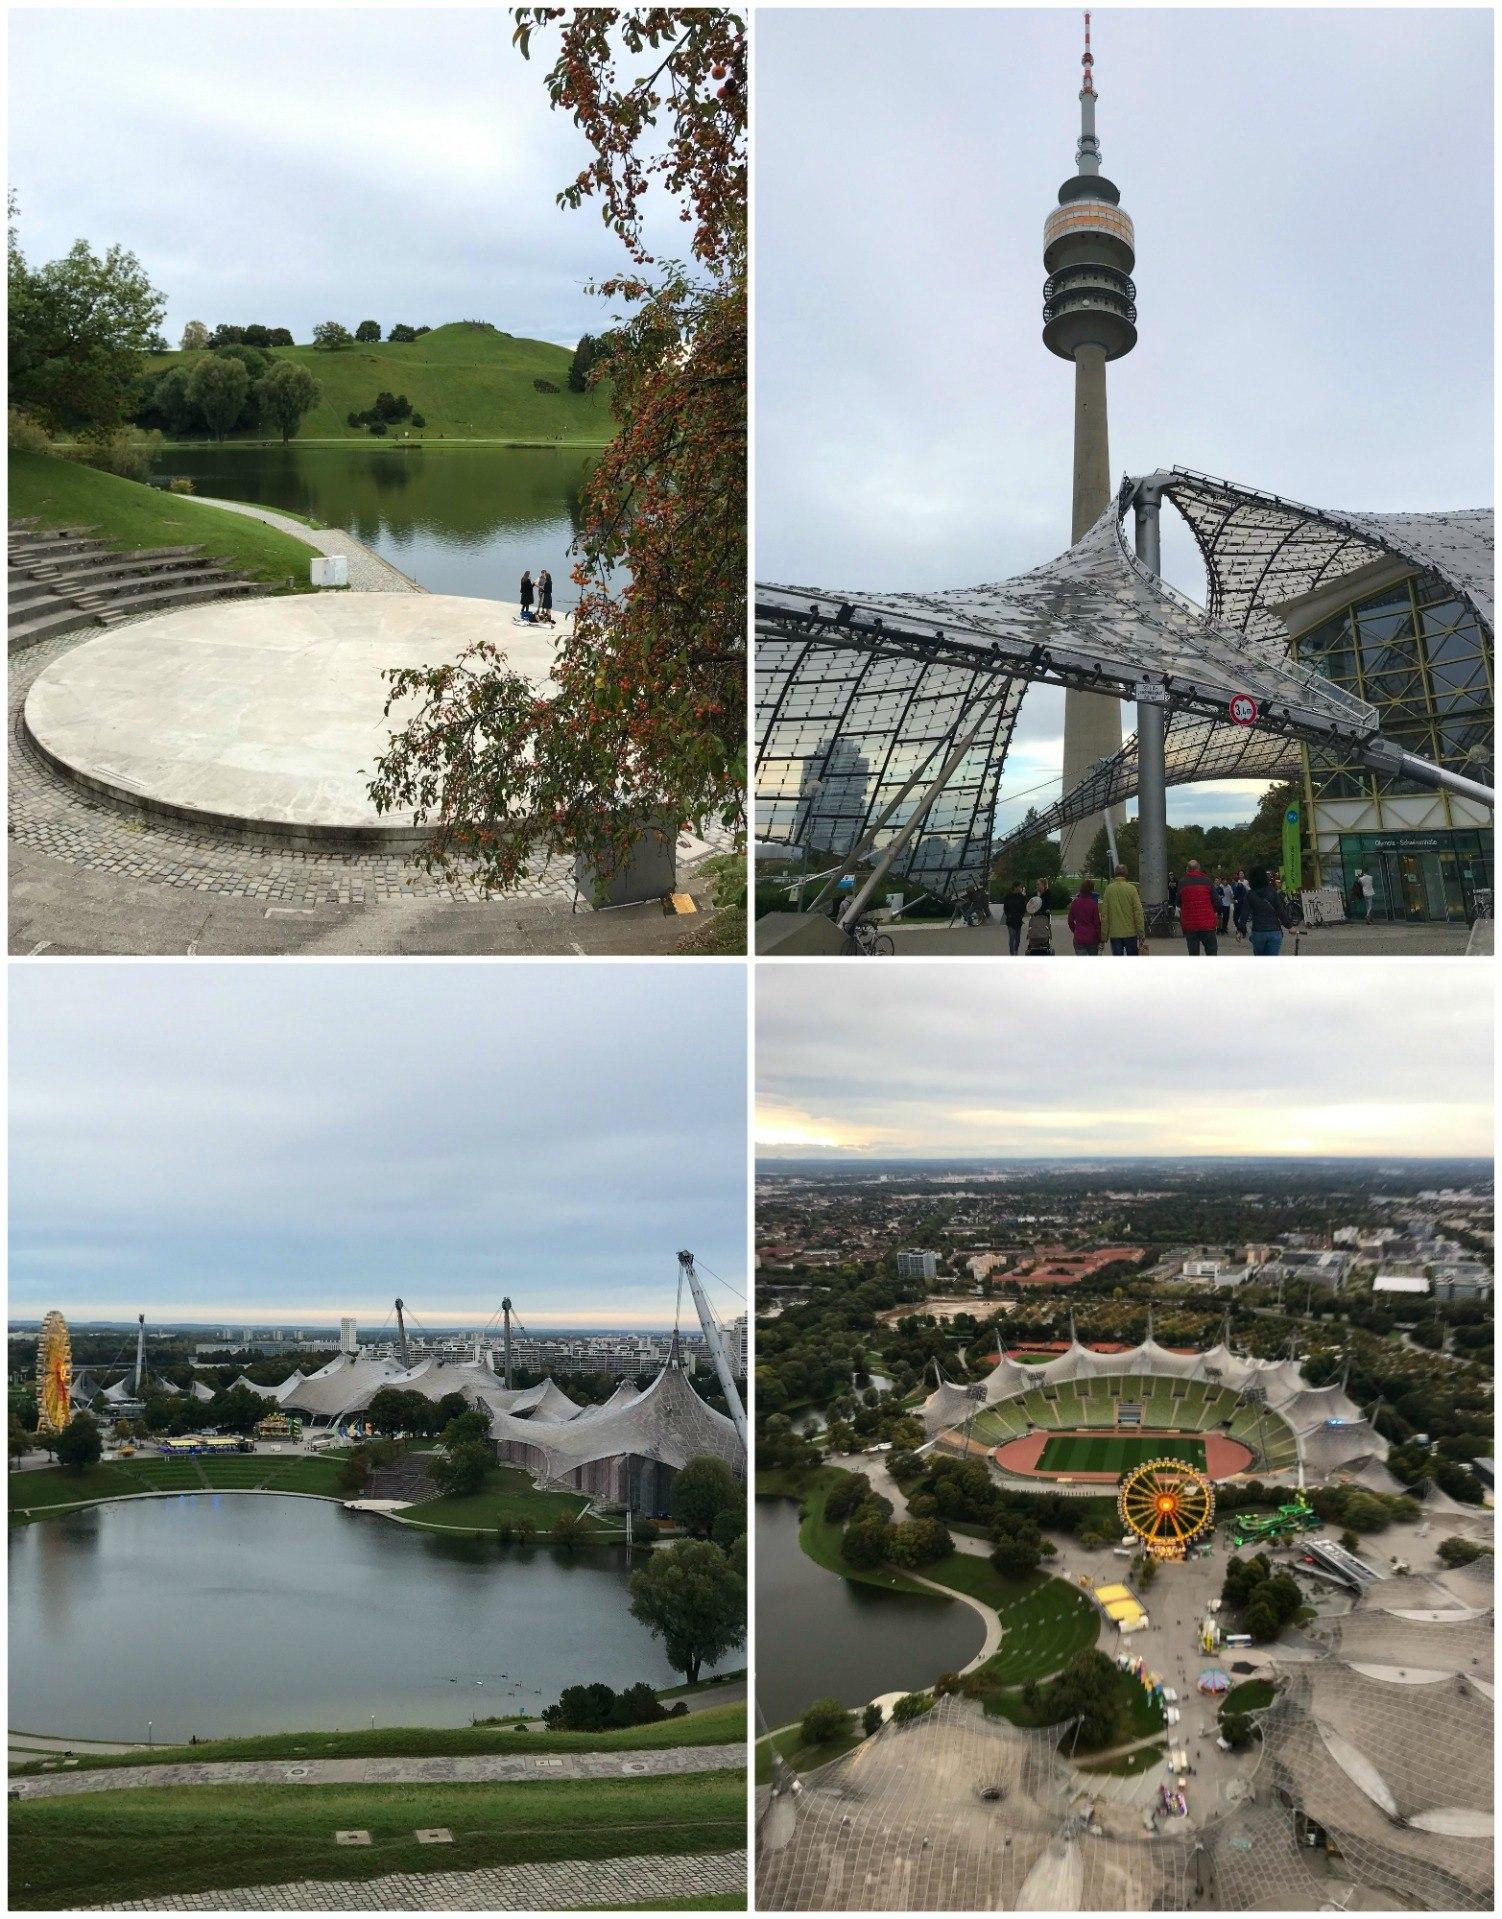 Olympiapark in Munich, Germany Photo Heatheronhertravels.com